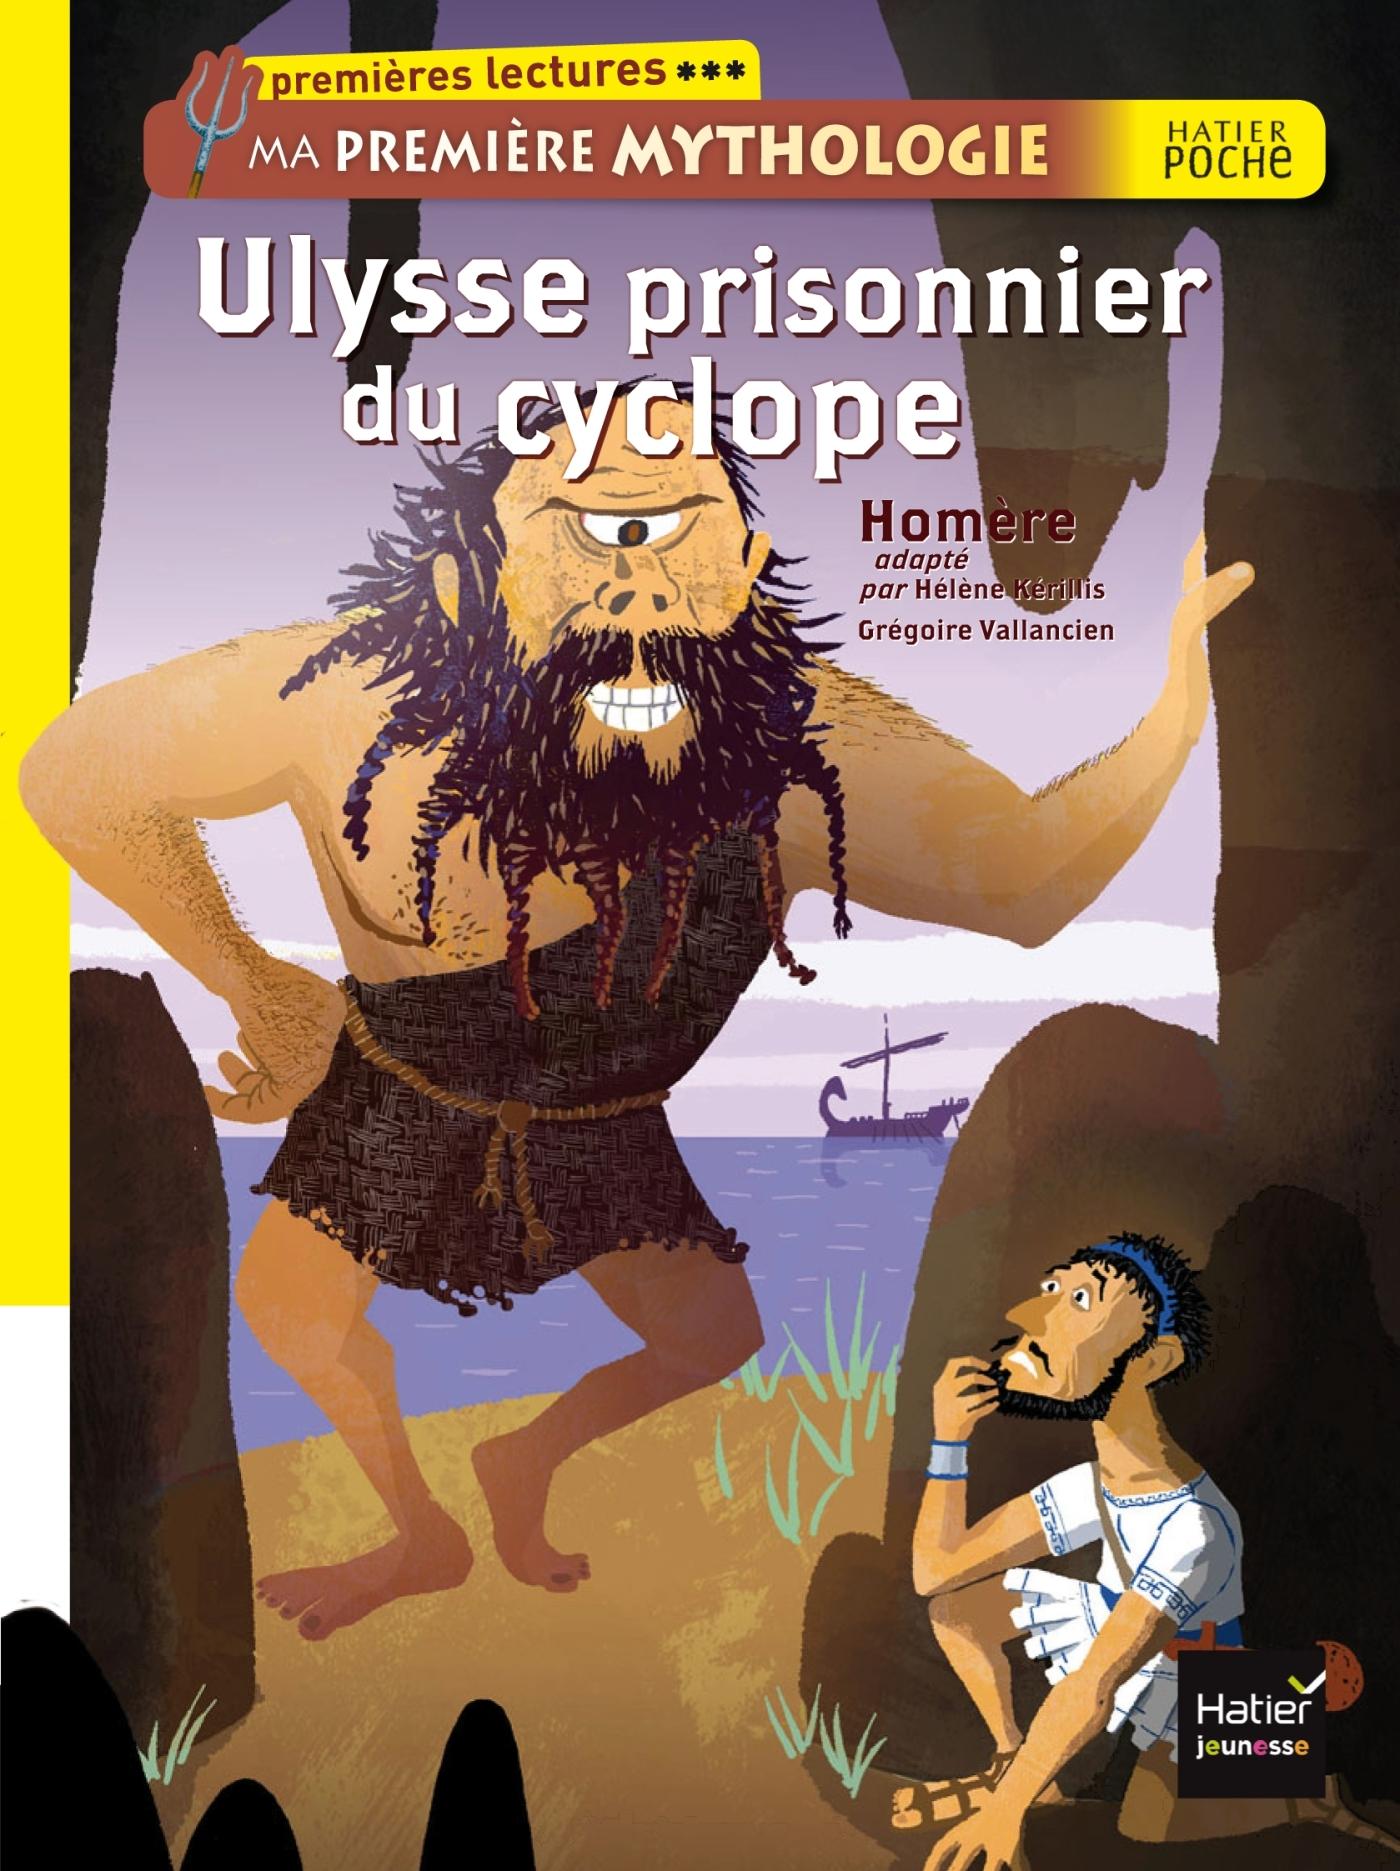 ULYSSE PRISONNIER DU CYCLOPE. MA PREMIERE MYTHOLOGIE